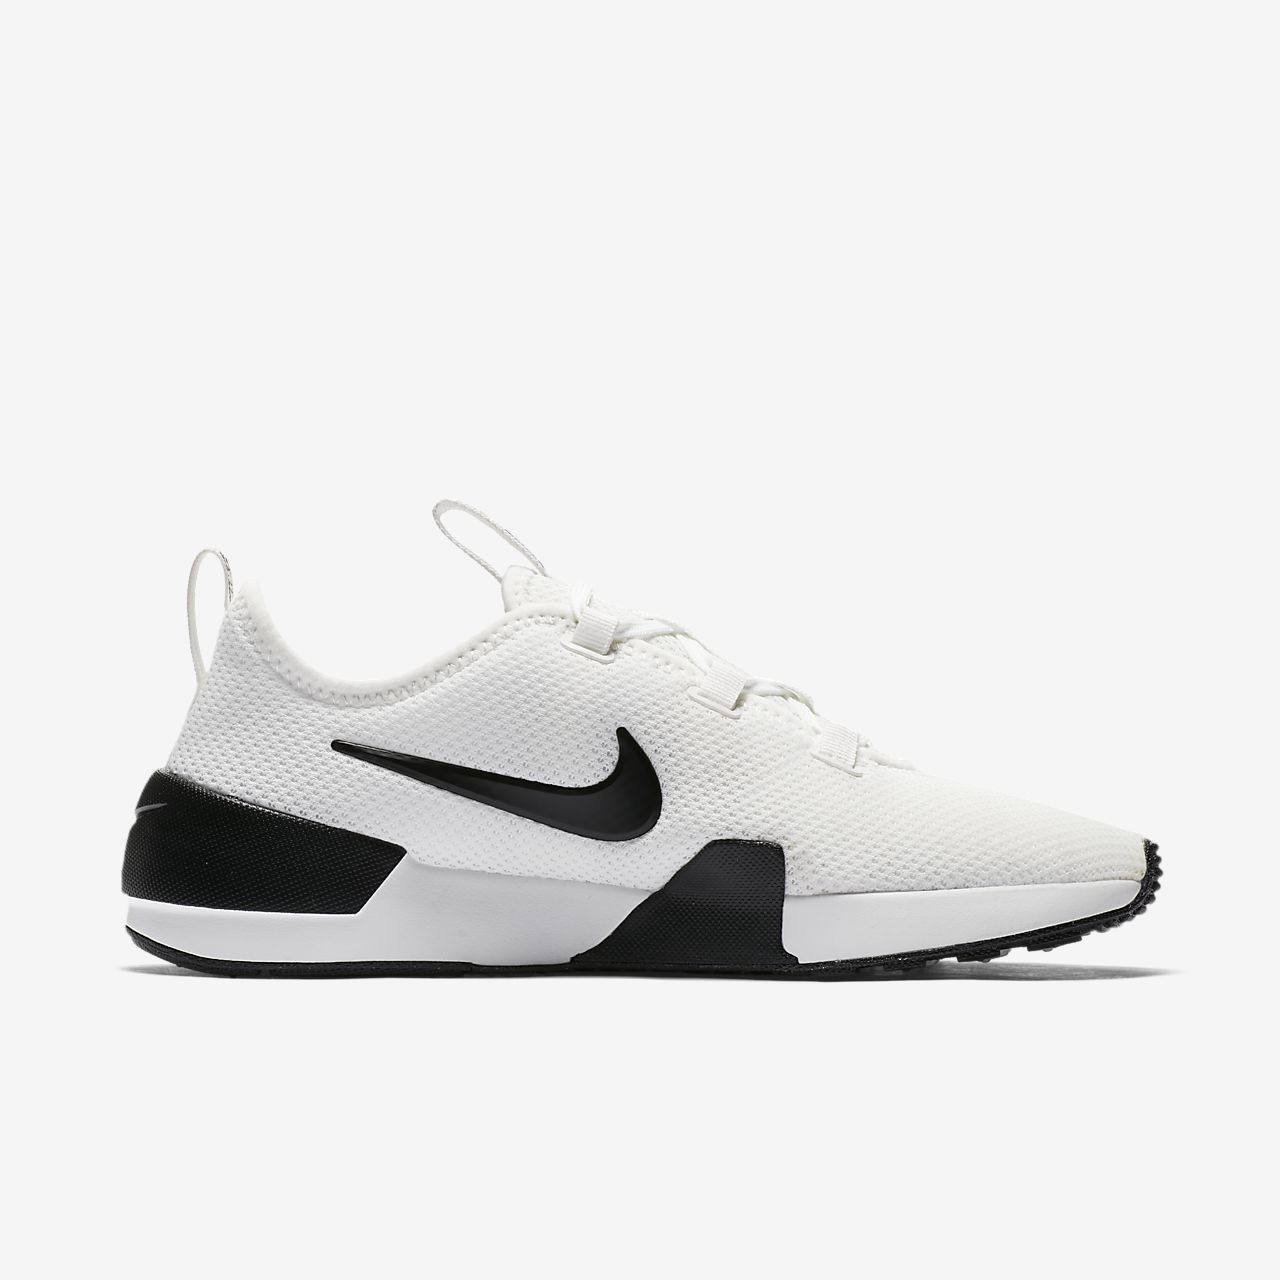 super popular 0c5ba e7e11 ... Nike Ashin Modern Run Womens Shoe